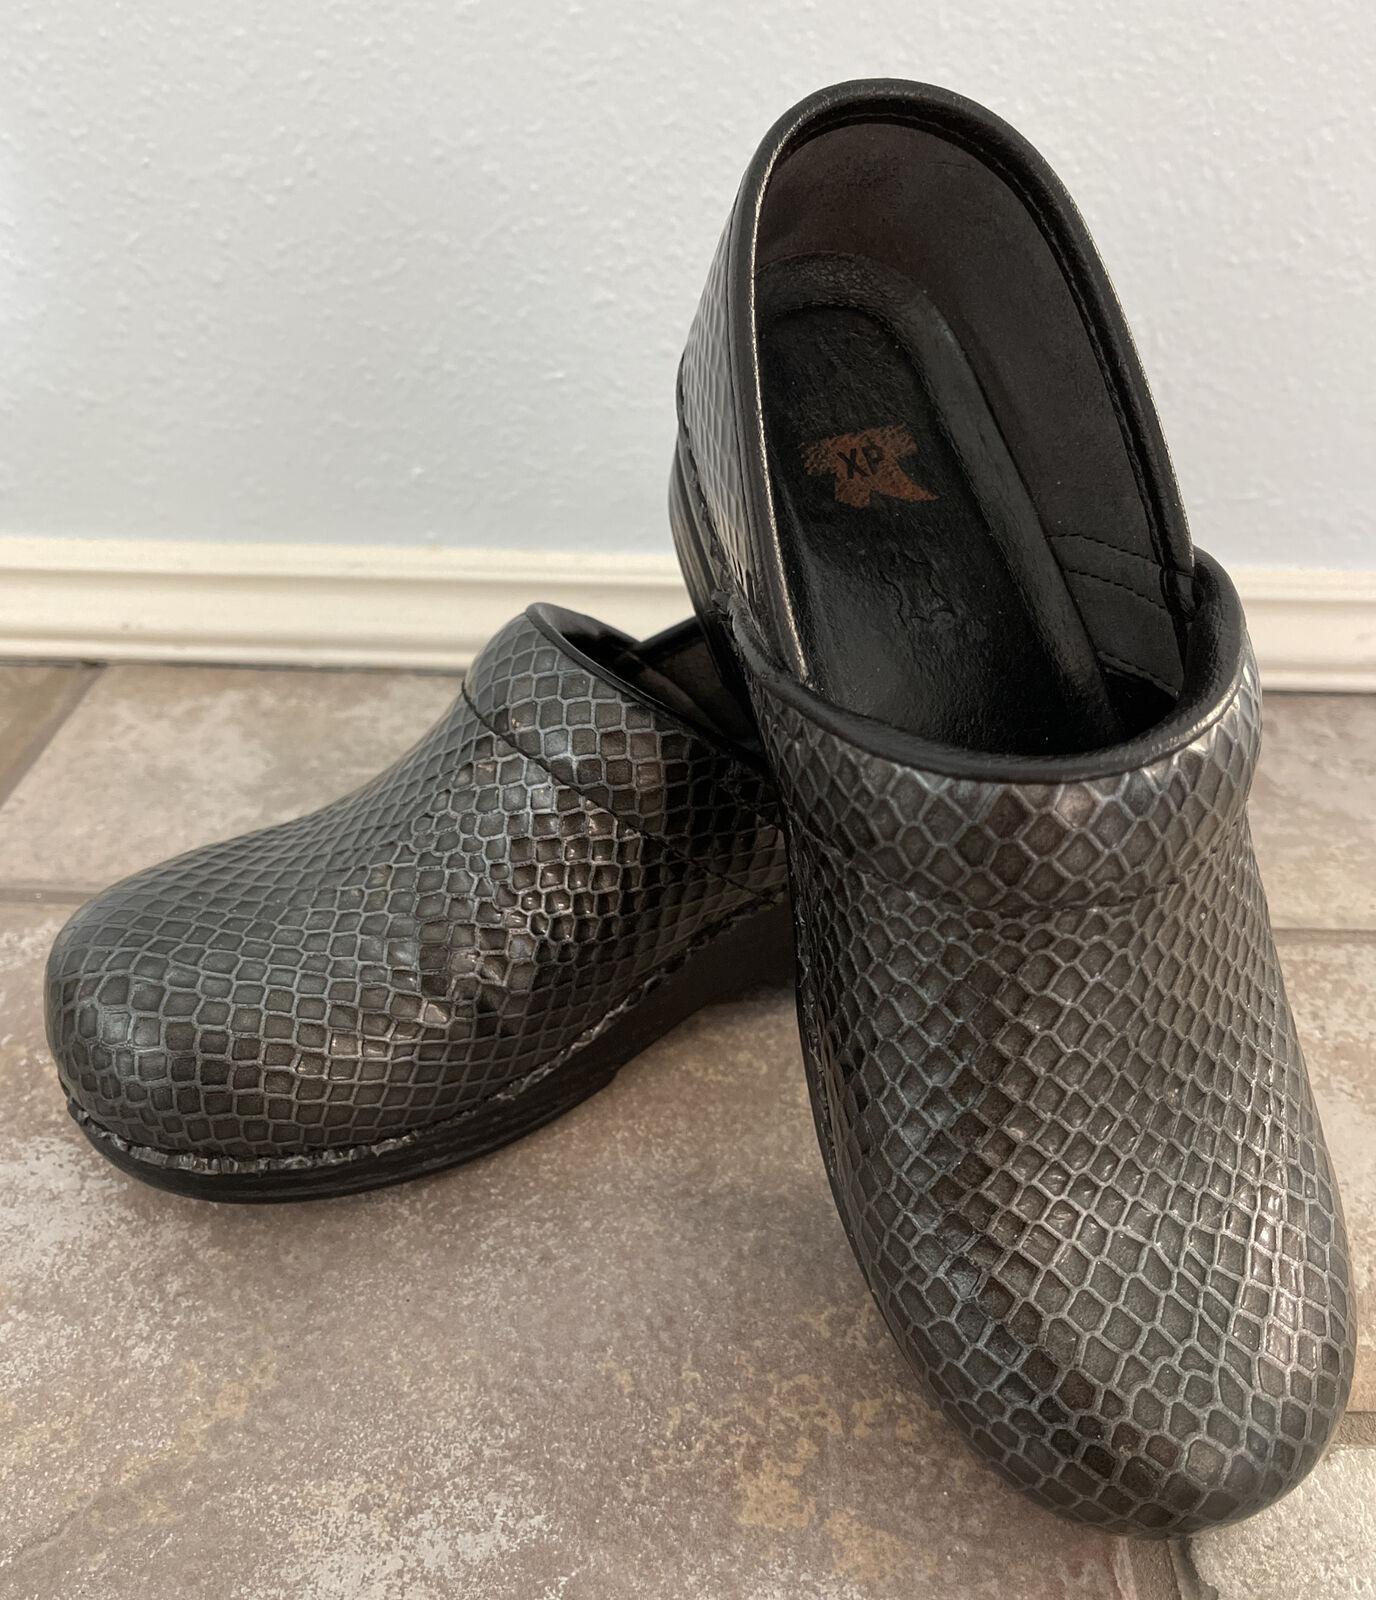 Dansko Black Patent Textured Honeycomb XP Clogs Leather, Size 38 EU (US 8)